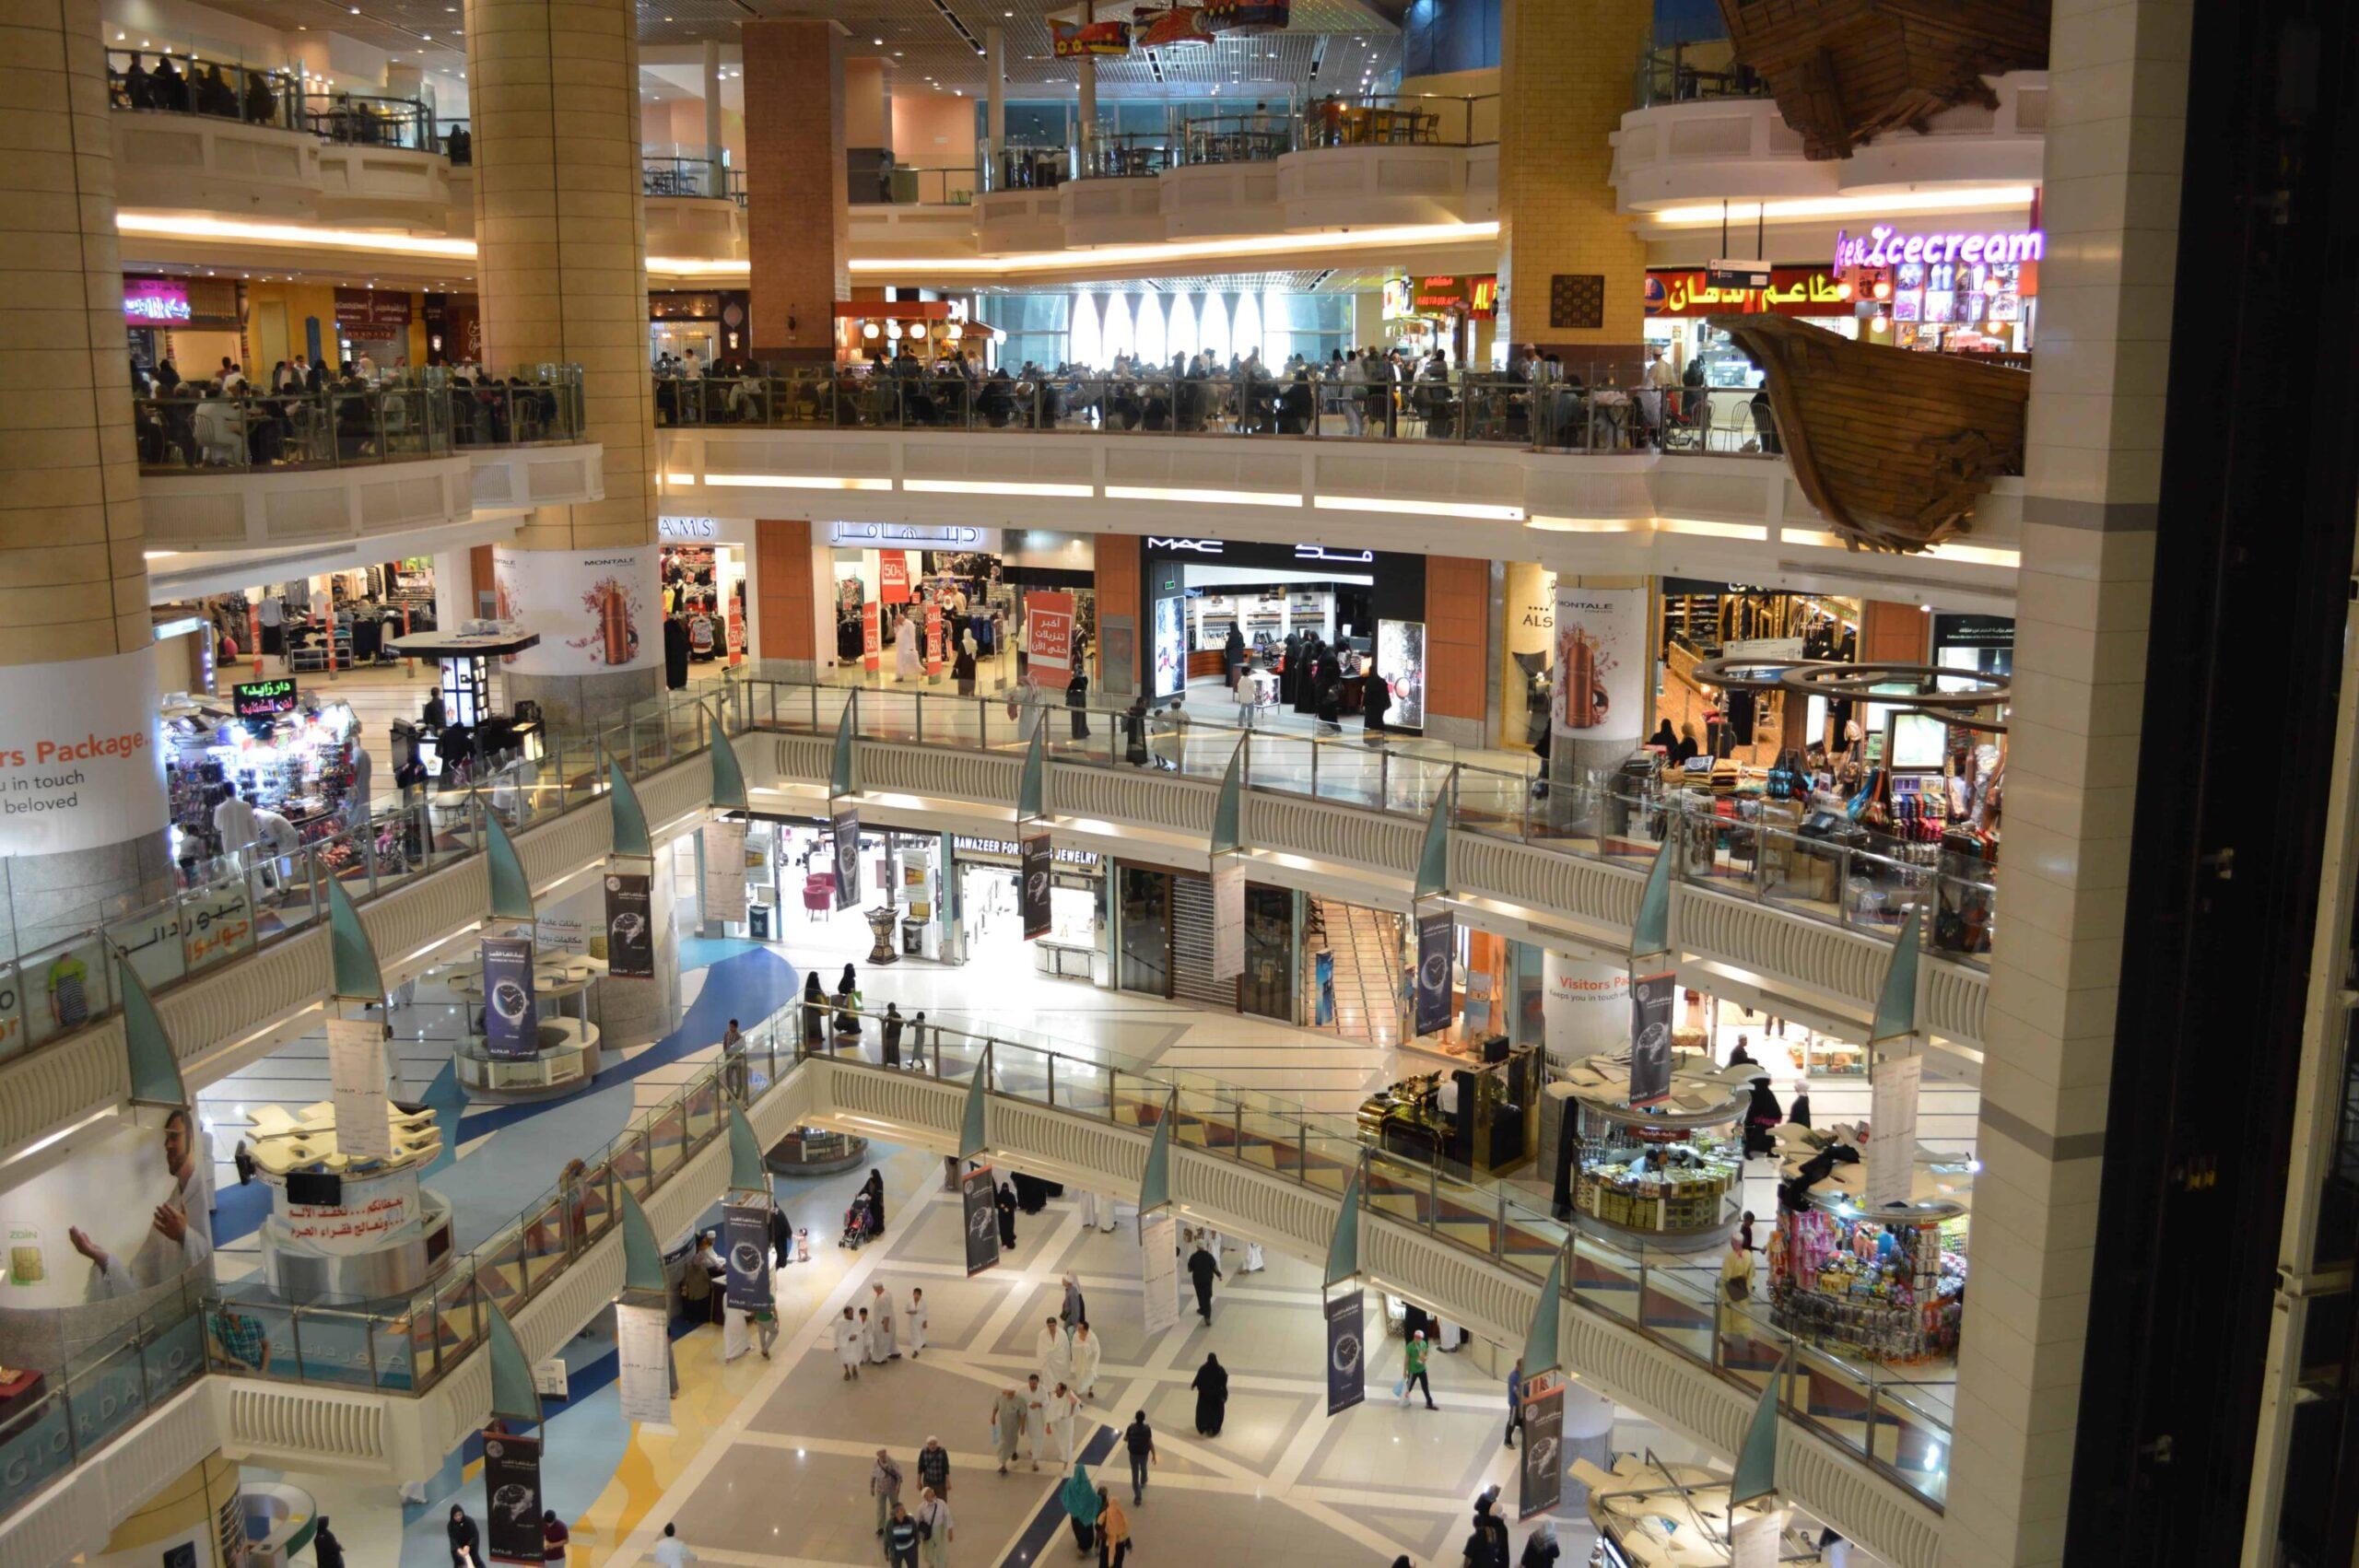 review al abraj mall makkah royal clock tower. Black Bedroom Furniture Sets. Home Design Ideas